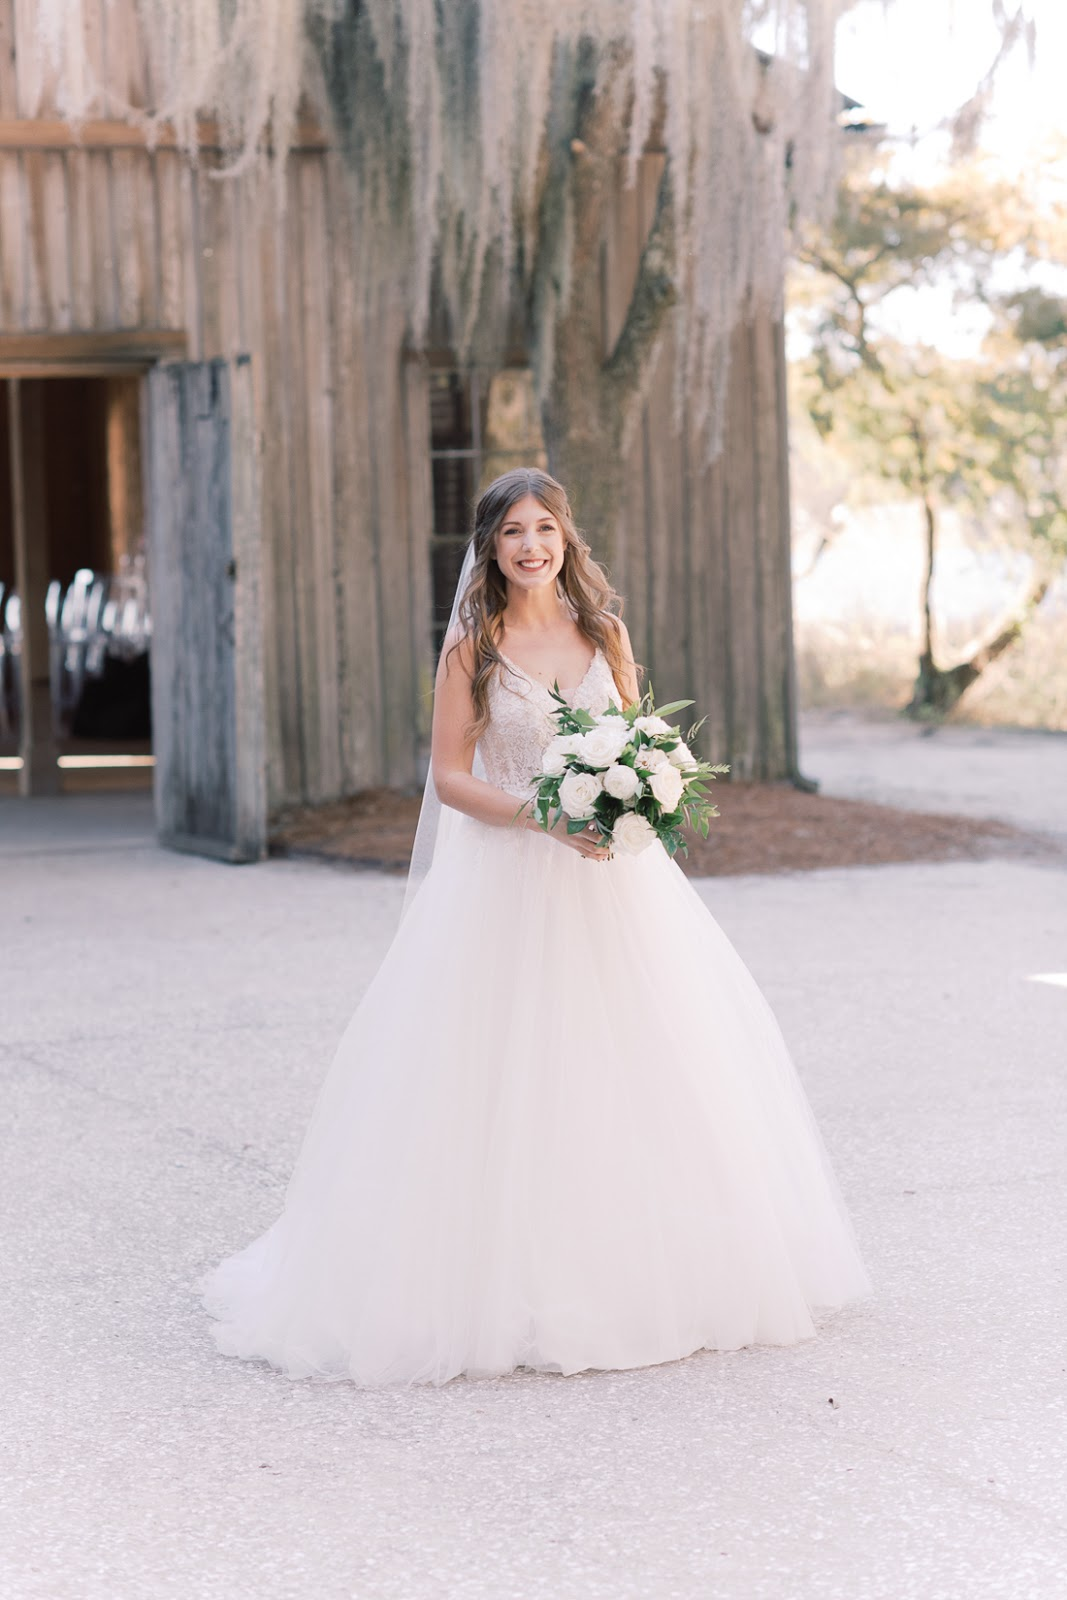 Bridal Portraits - Chasing Cinderella